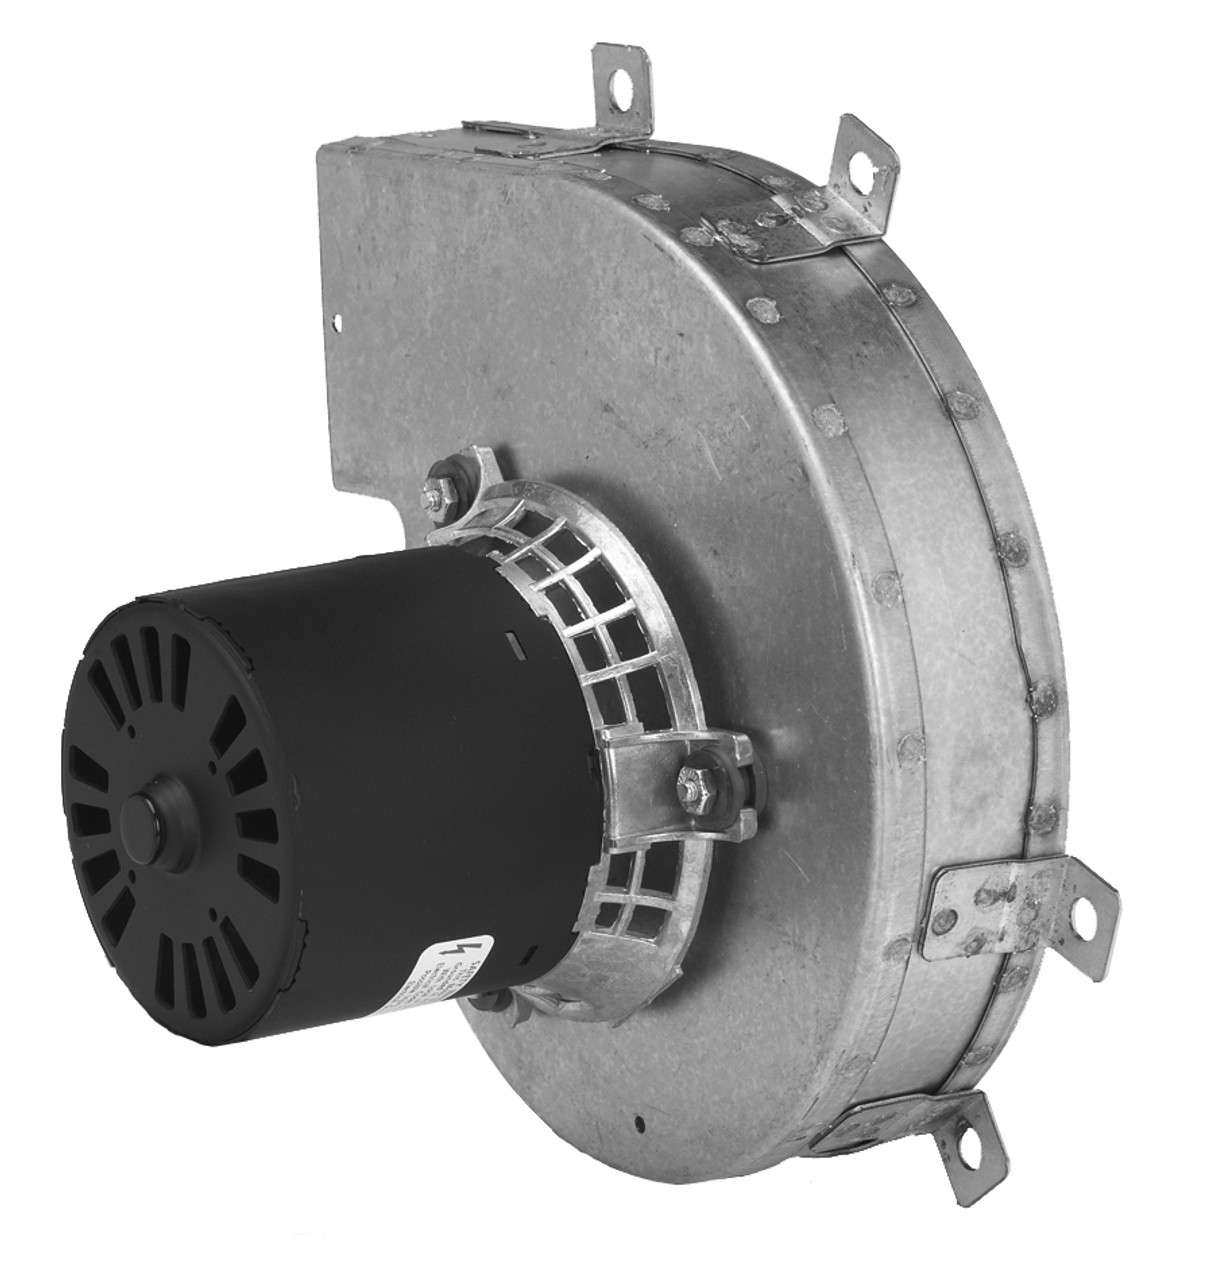 Goodman Furnace Draft Inducer Blower 115v 7021 8252 D6996405 Fasco A281